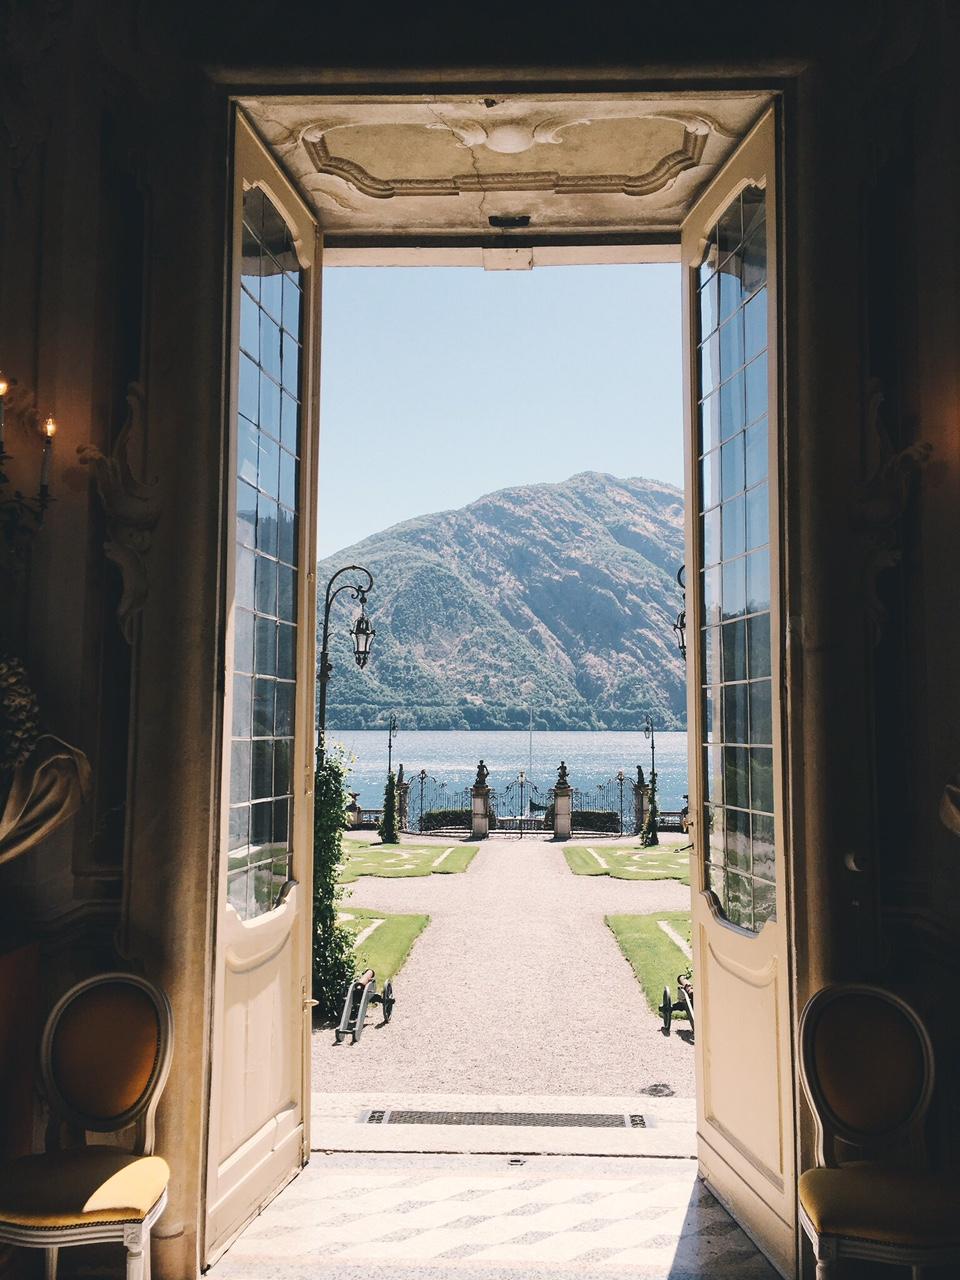 Villa Sola Cabiati view from doors of villa